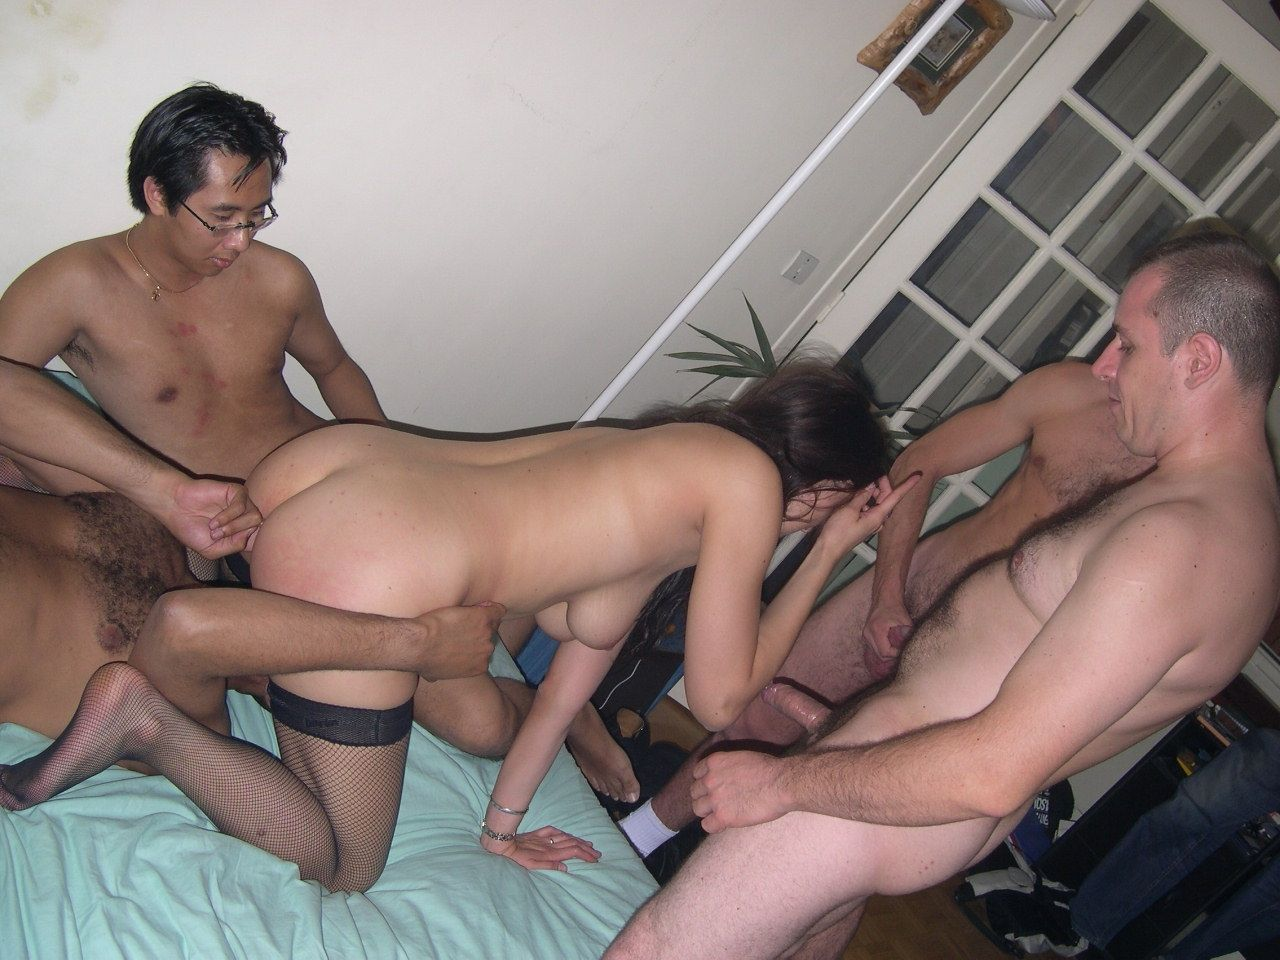 Amature group sex movies, emo veronica nude